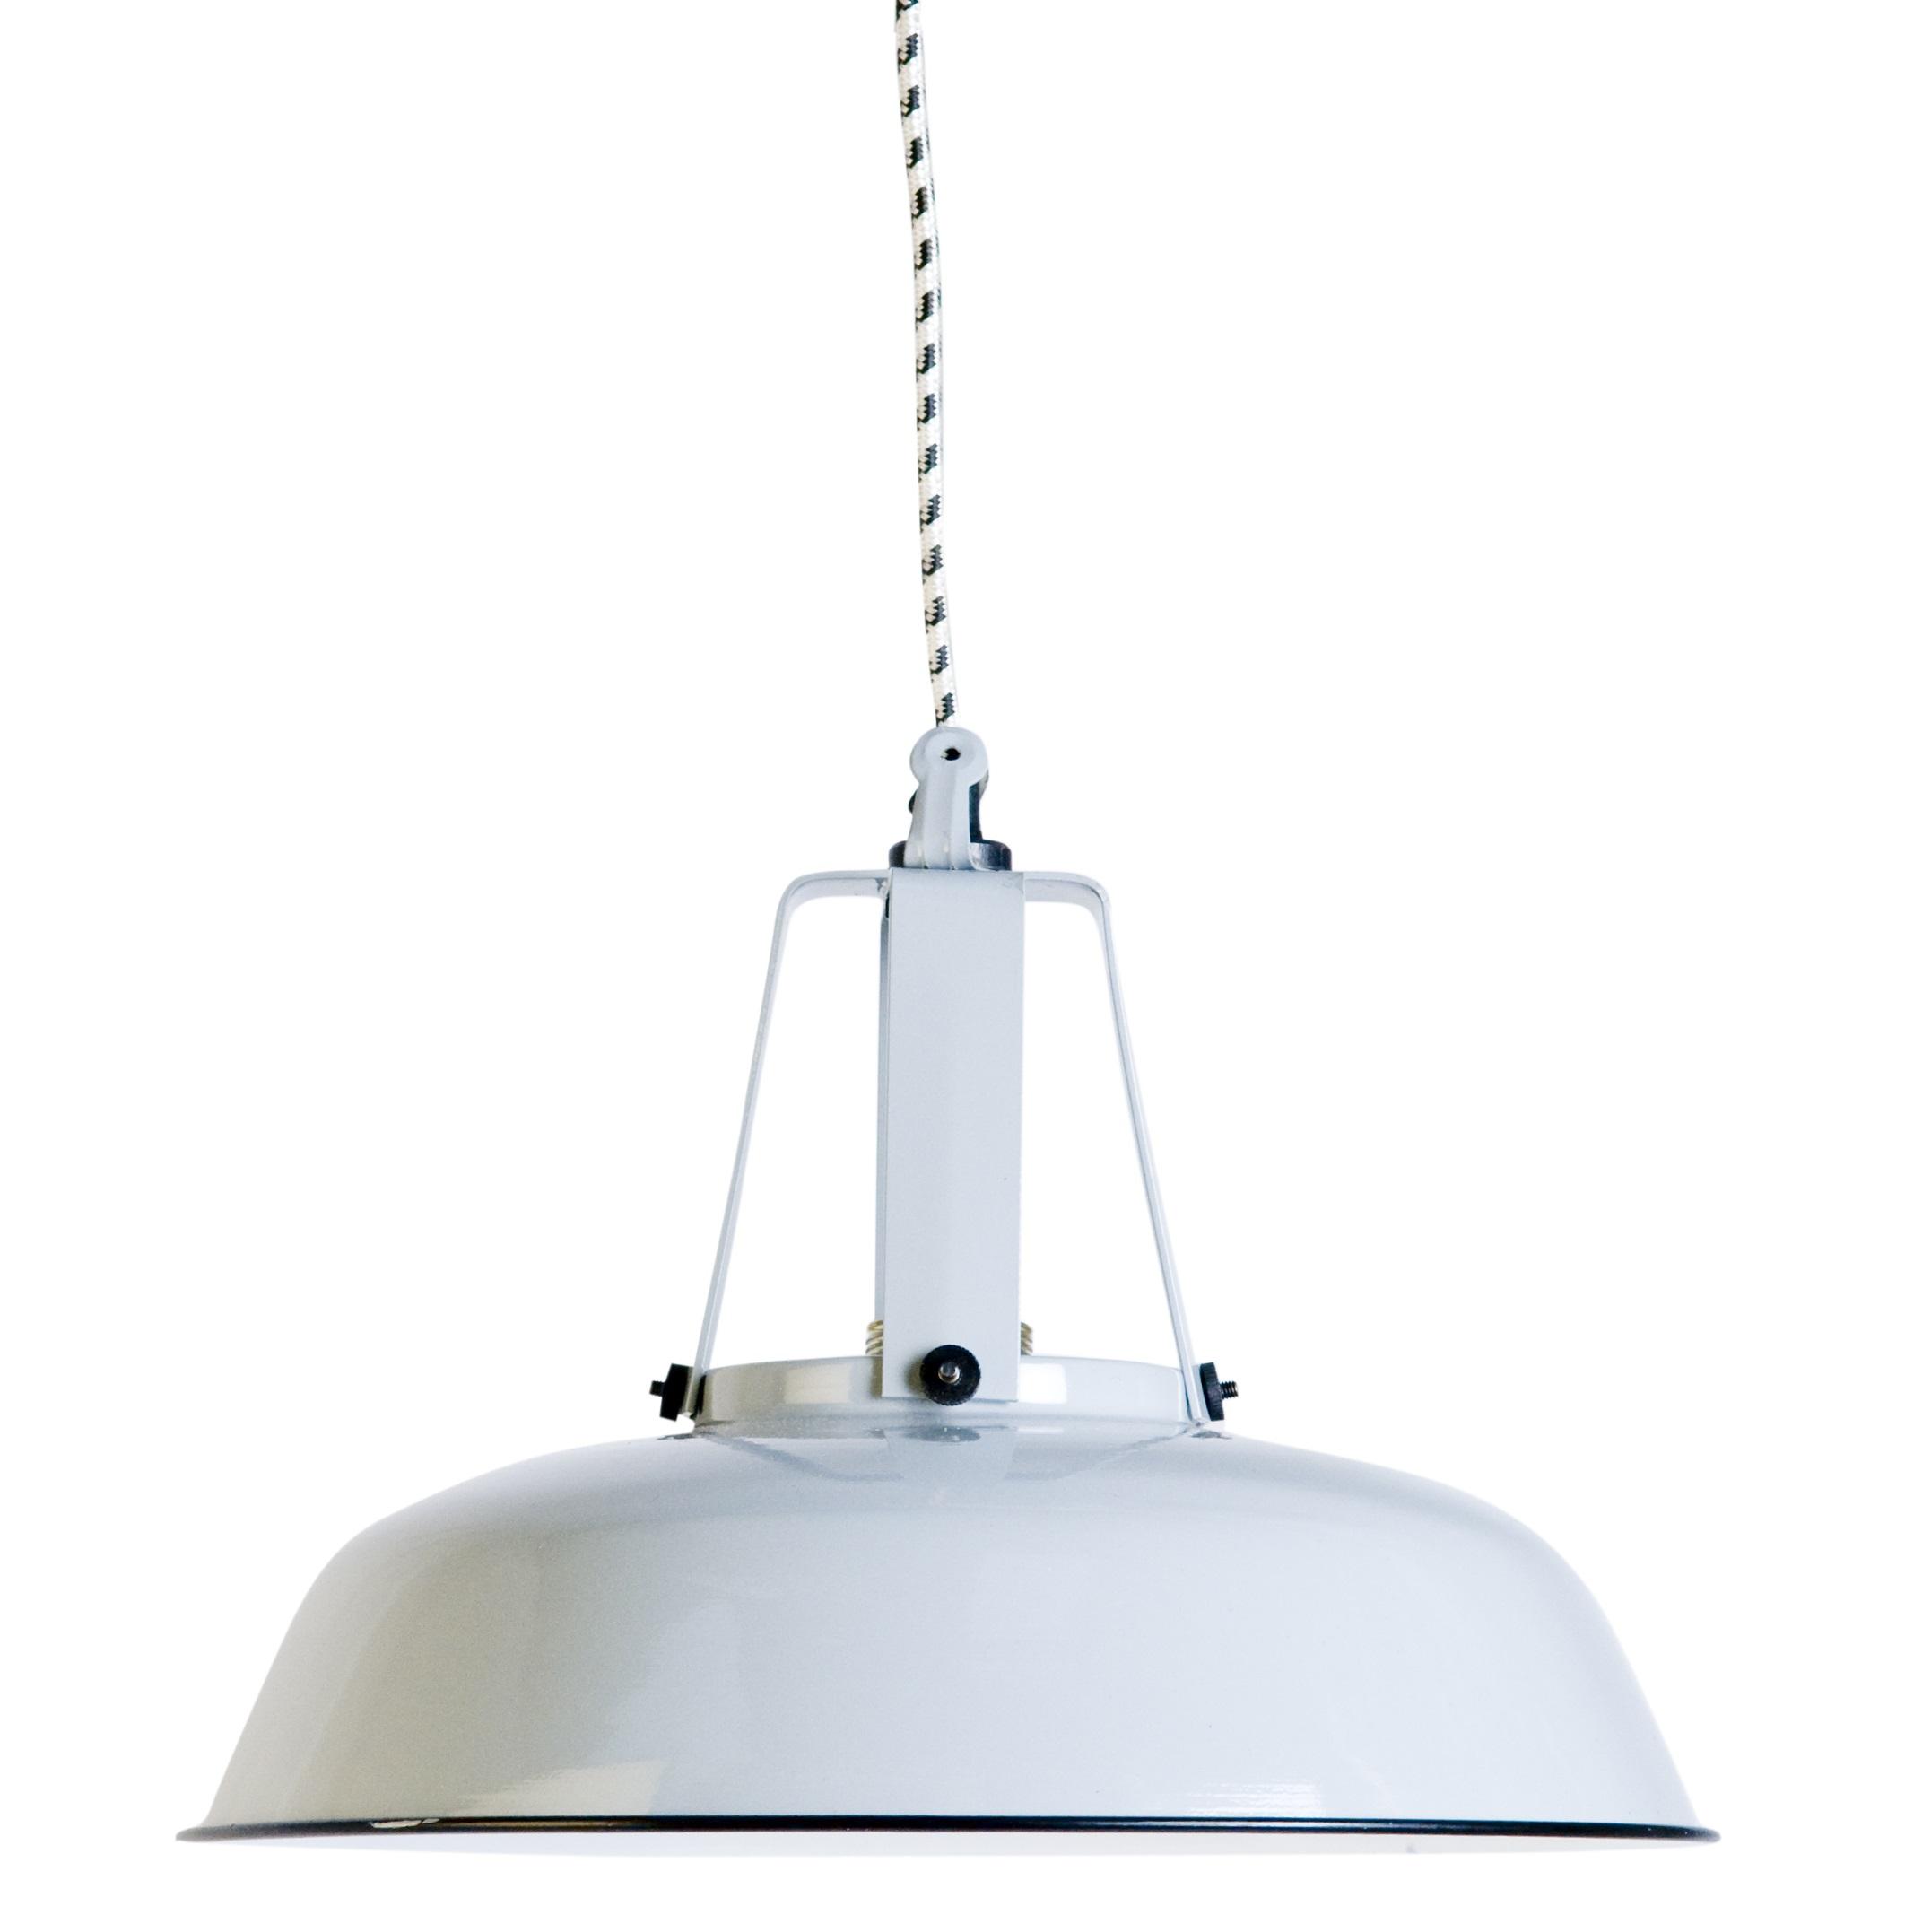 Industriele Keuken Kopen : Hk Living Workshop industri?le hanglamp. Online kopen.